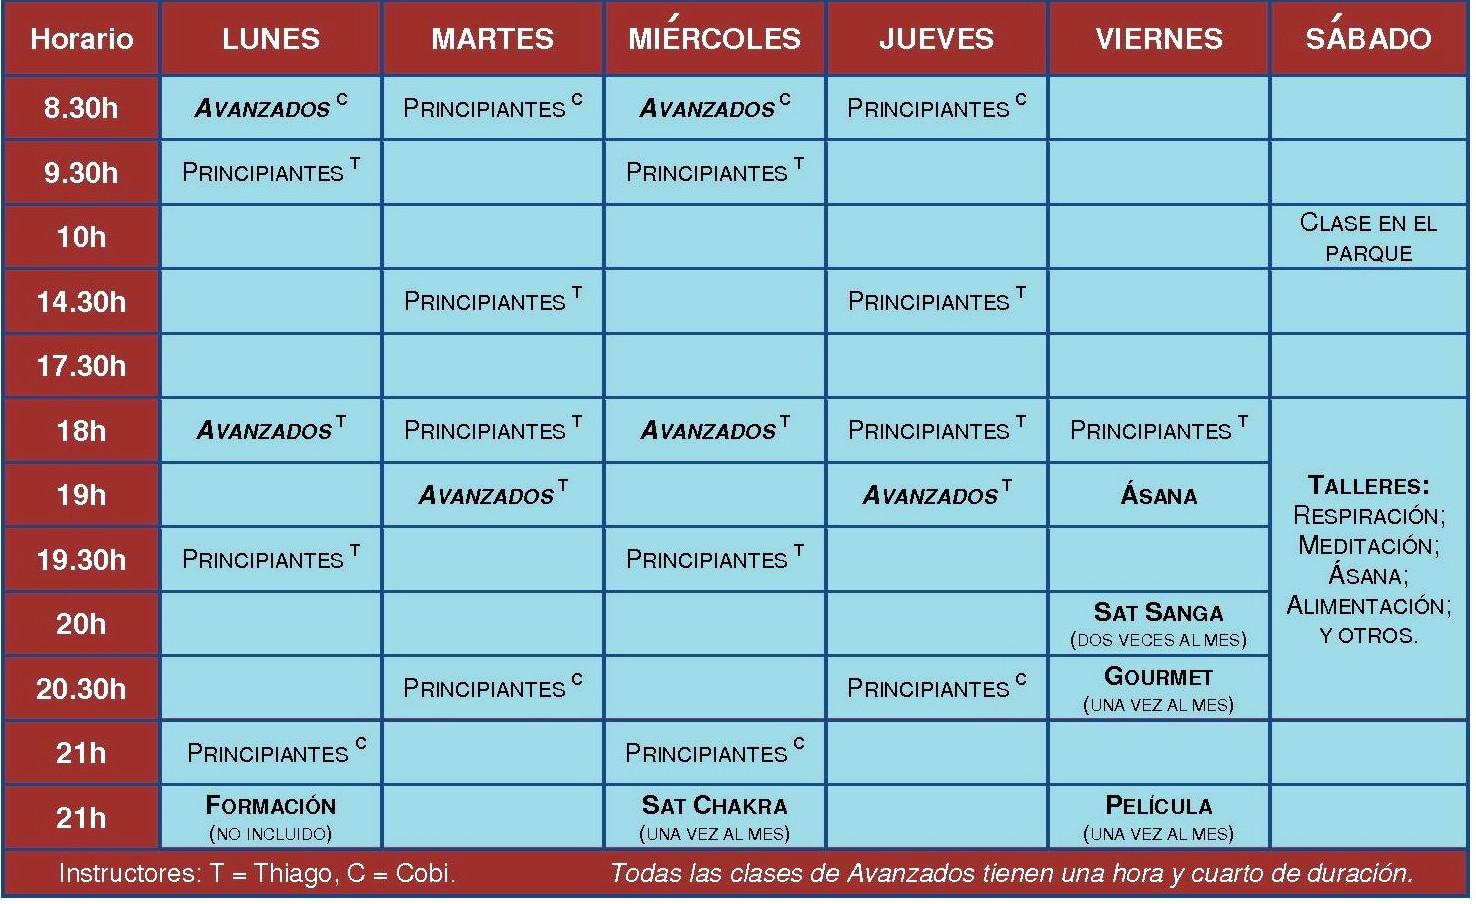 Nuevos horarios a partir del 1de septiembre derose for Horario oficina ing barcelona